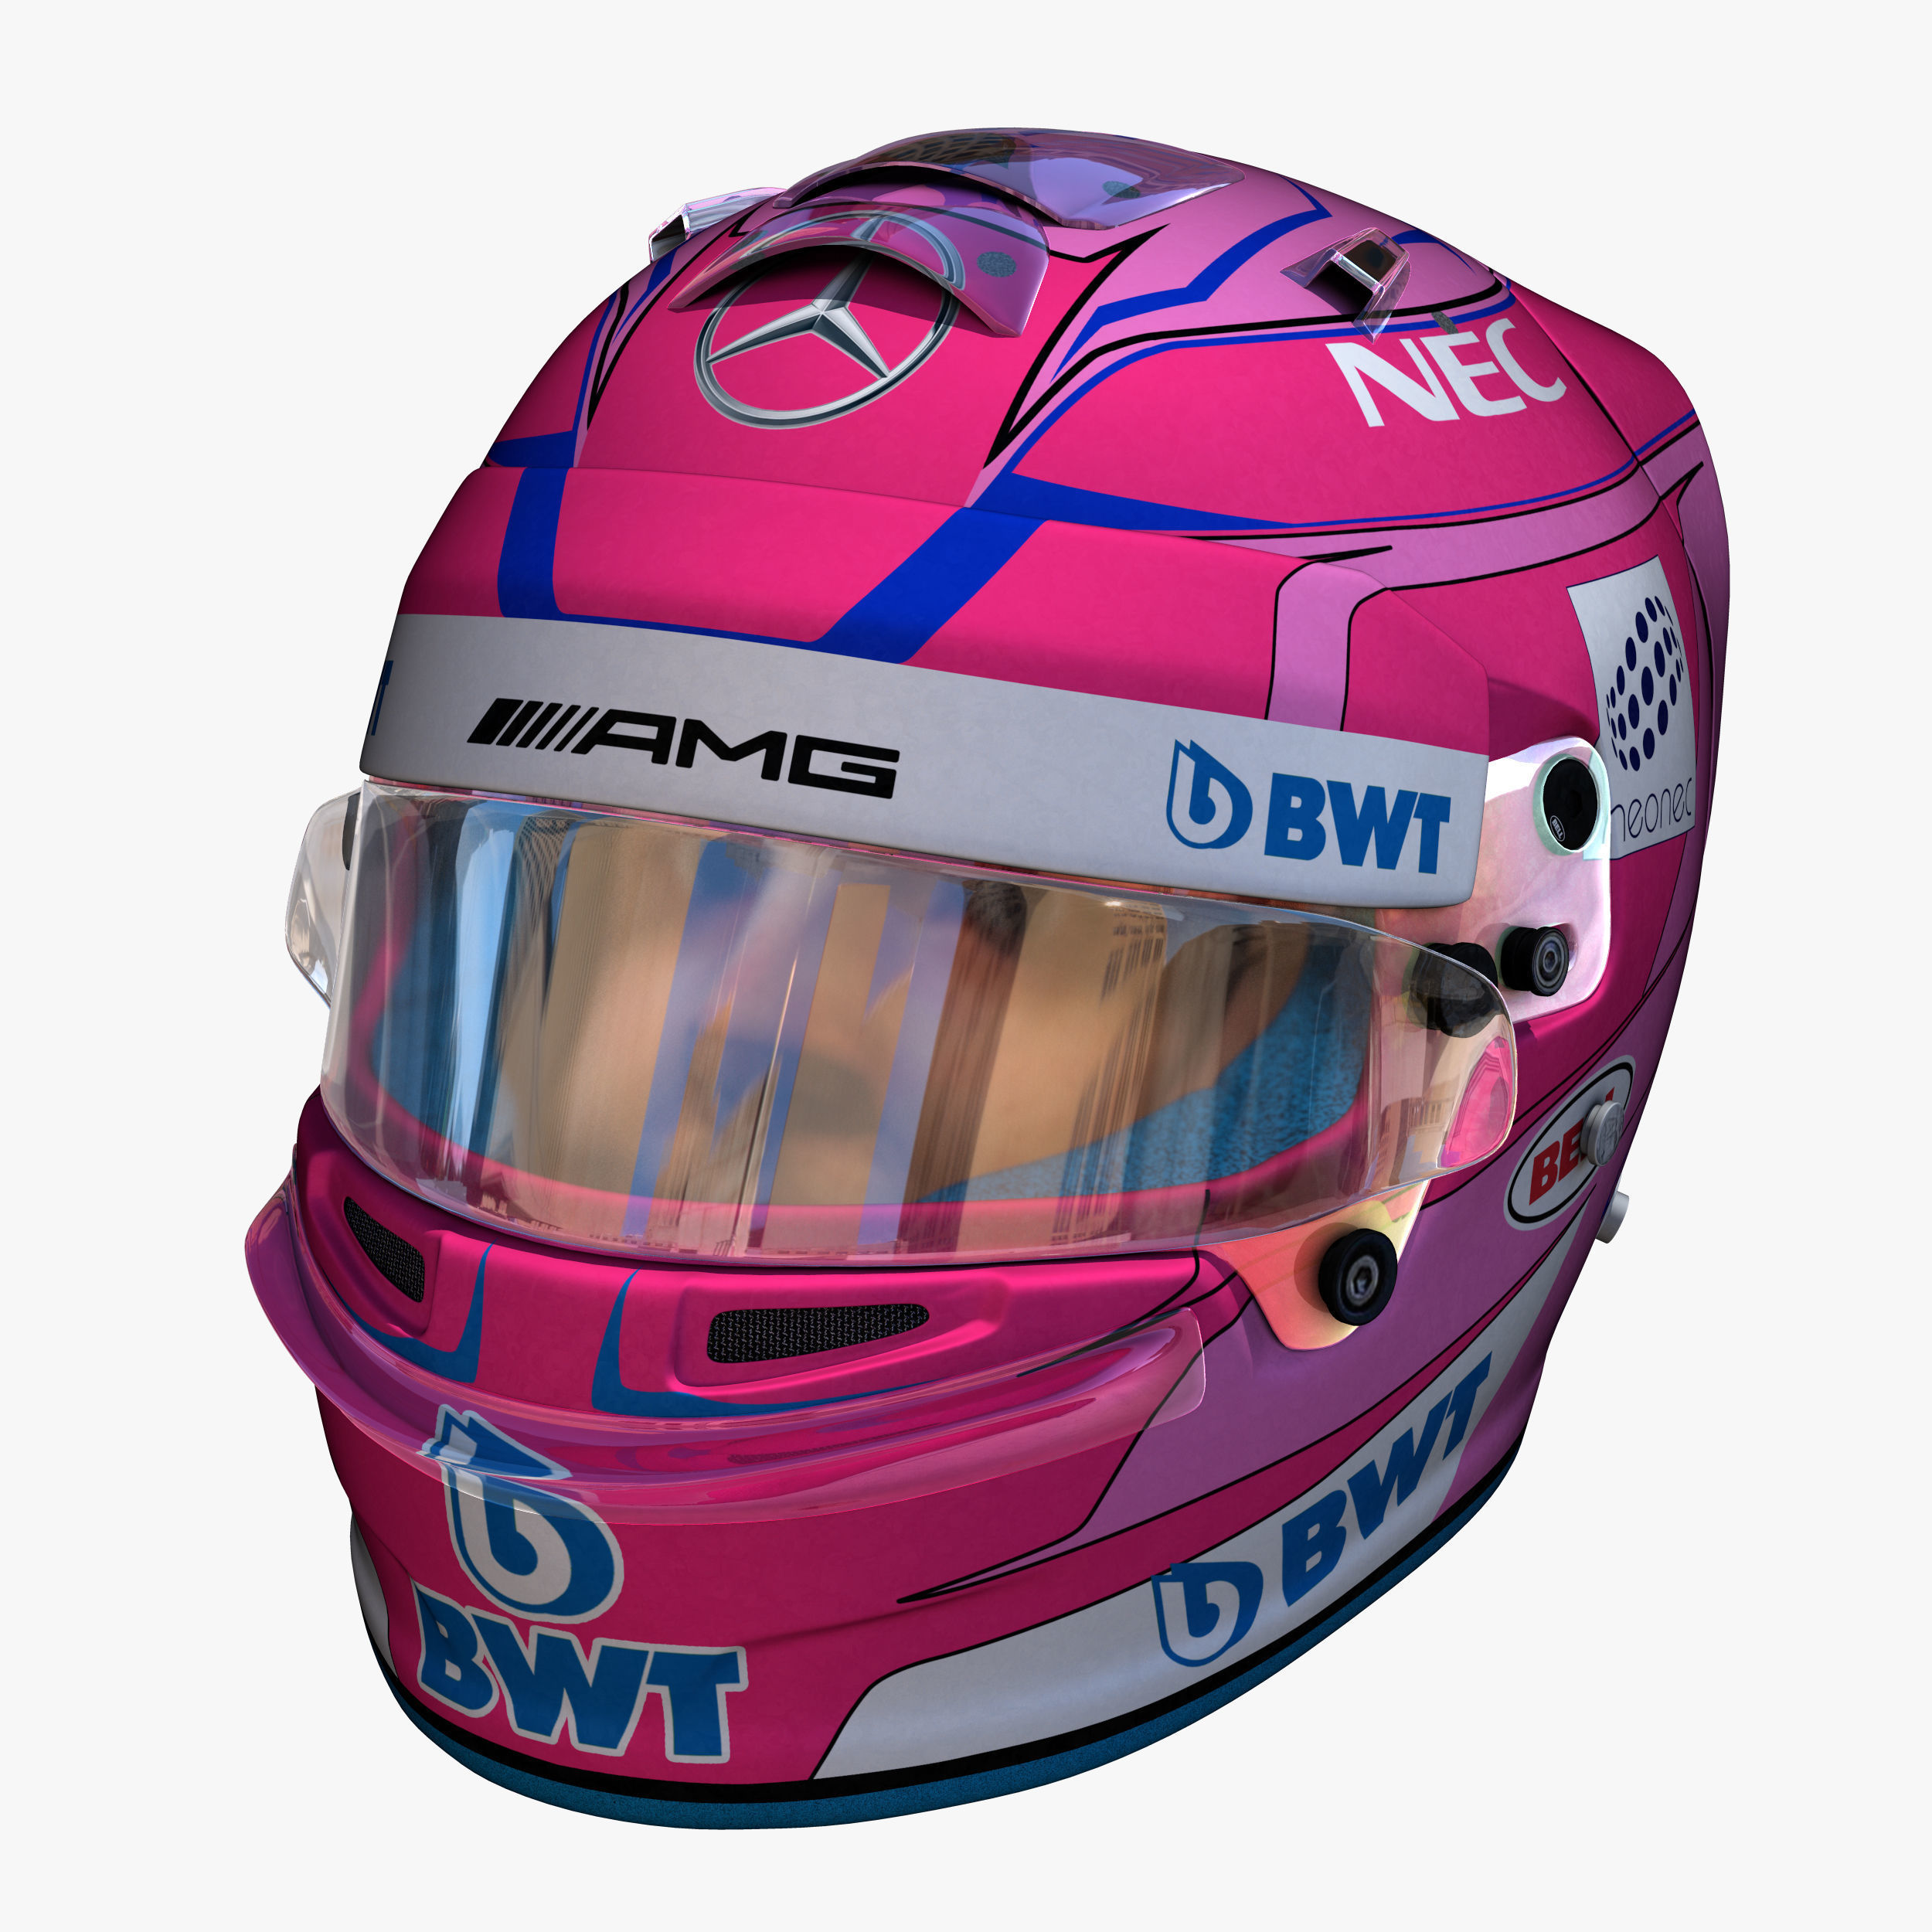 Ocon Helmet 2018 | 3D model